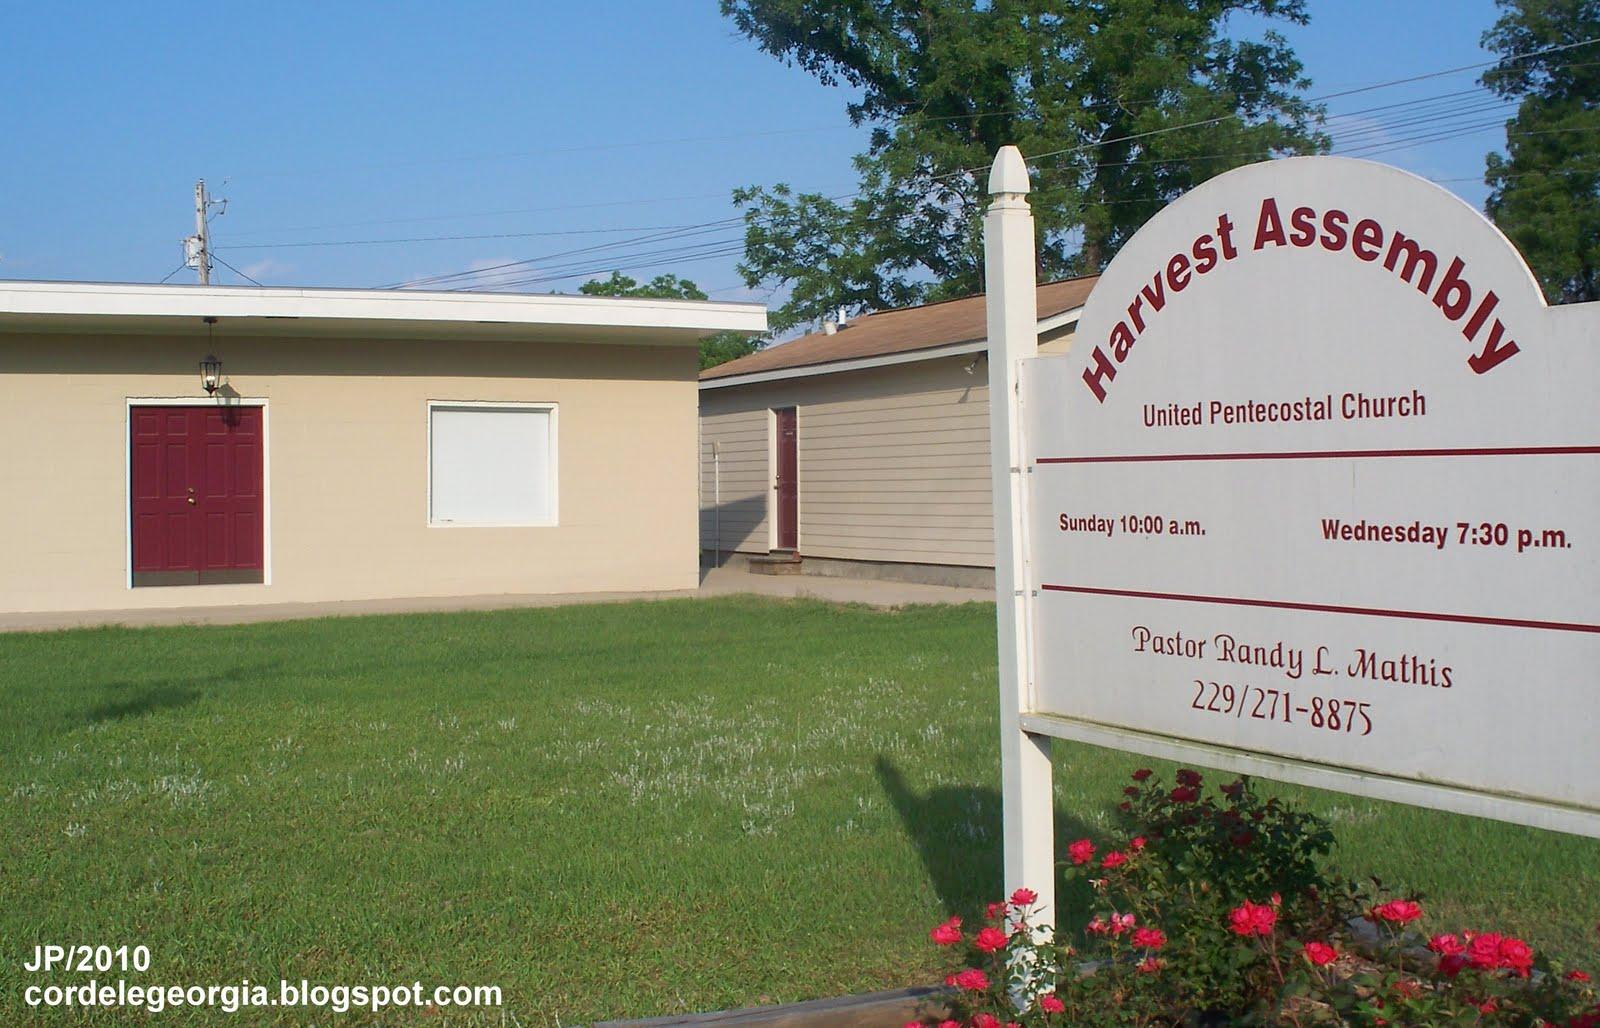 Cordele (GA) United States  city images : ... CHURCHES, United Pentecostal Church, Cordele Georgia Crisp County GA